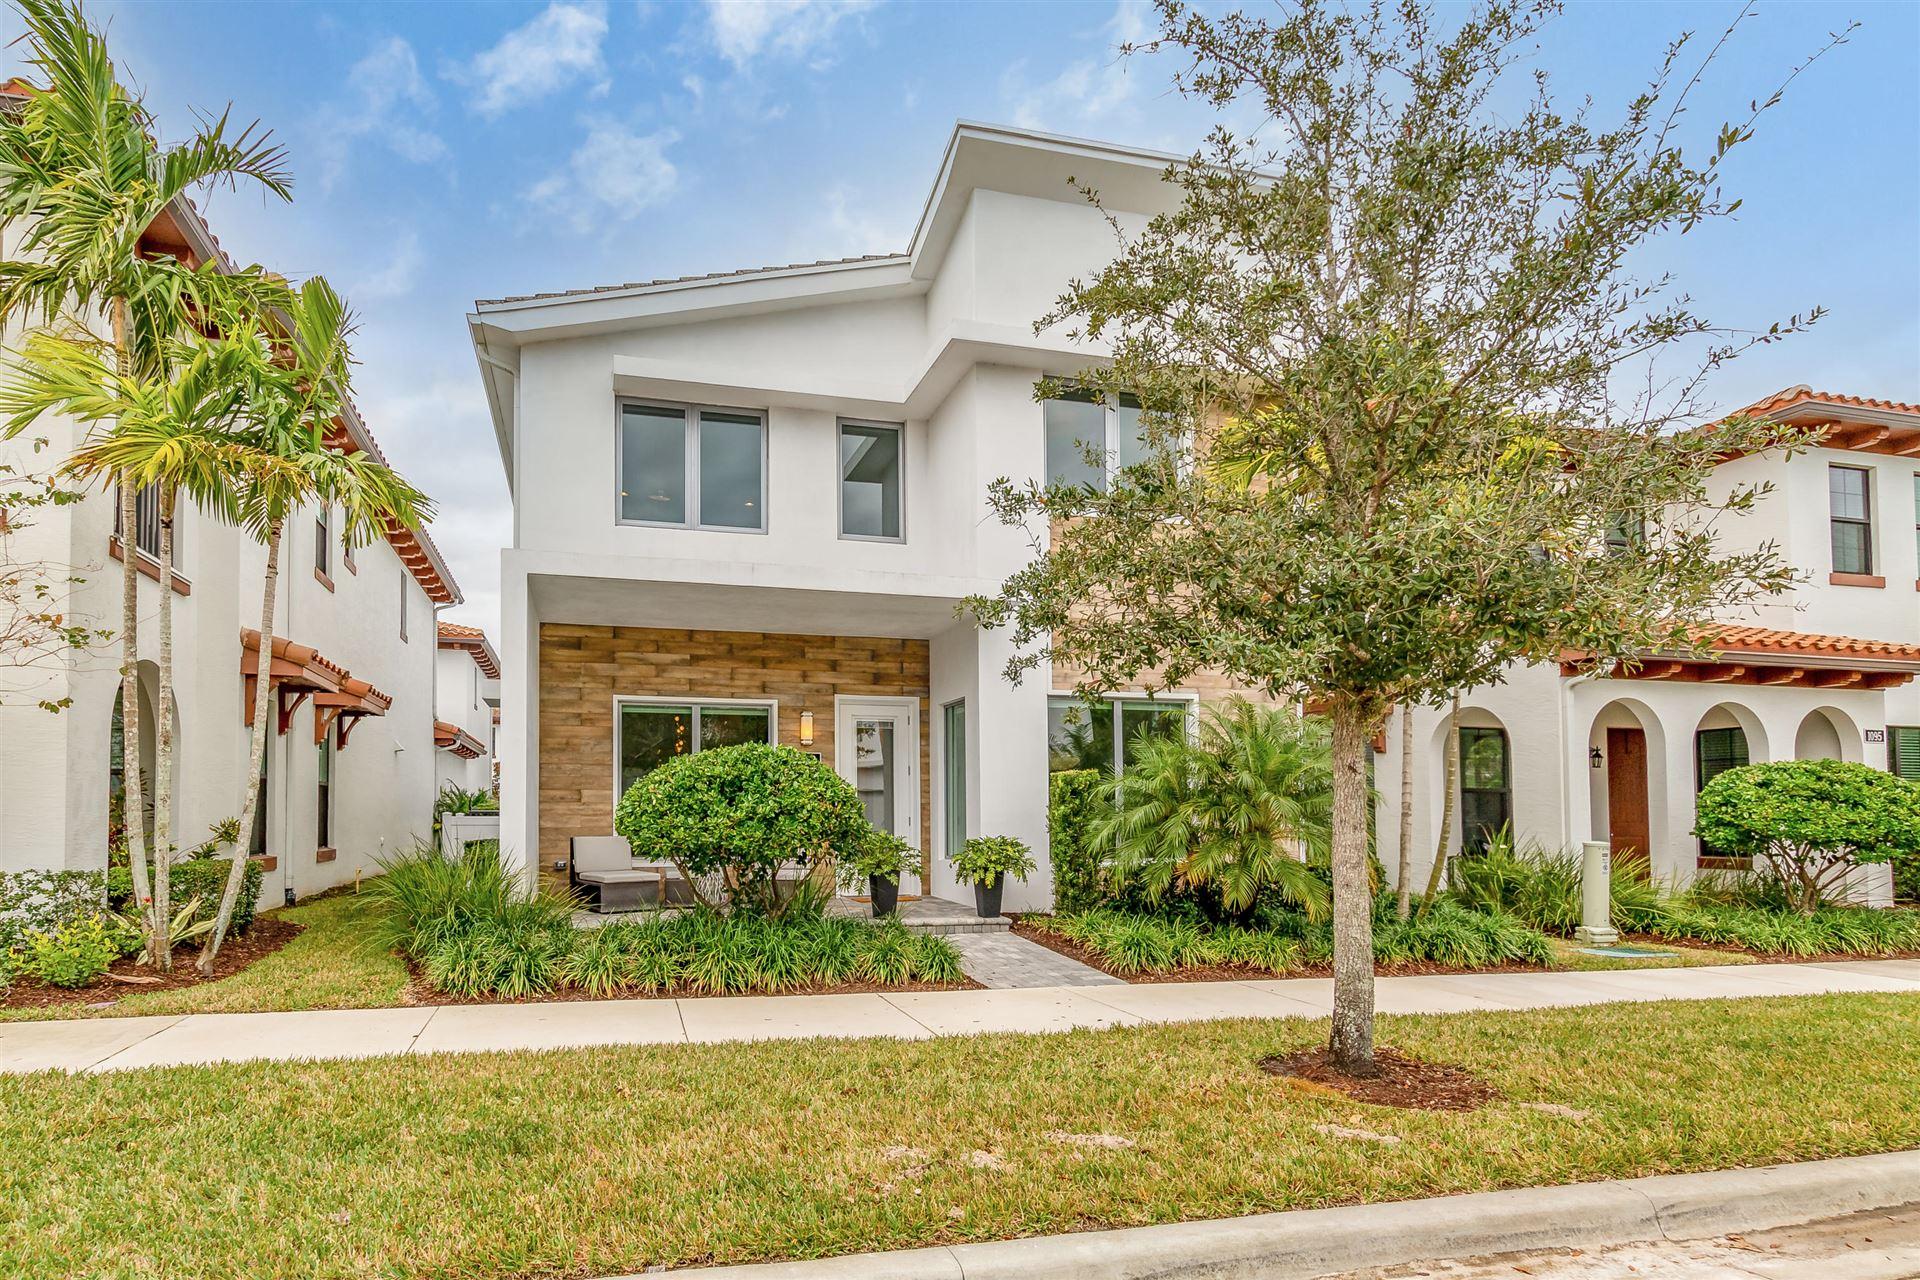 Photo of 1093 Faulkner Terrace, Palm Beach Gardens, FL 33418 (MLS # RX-10702657)